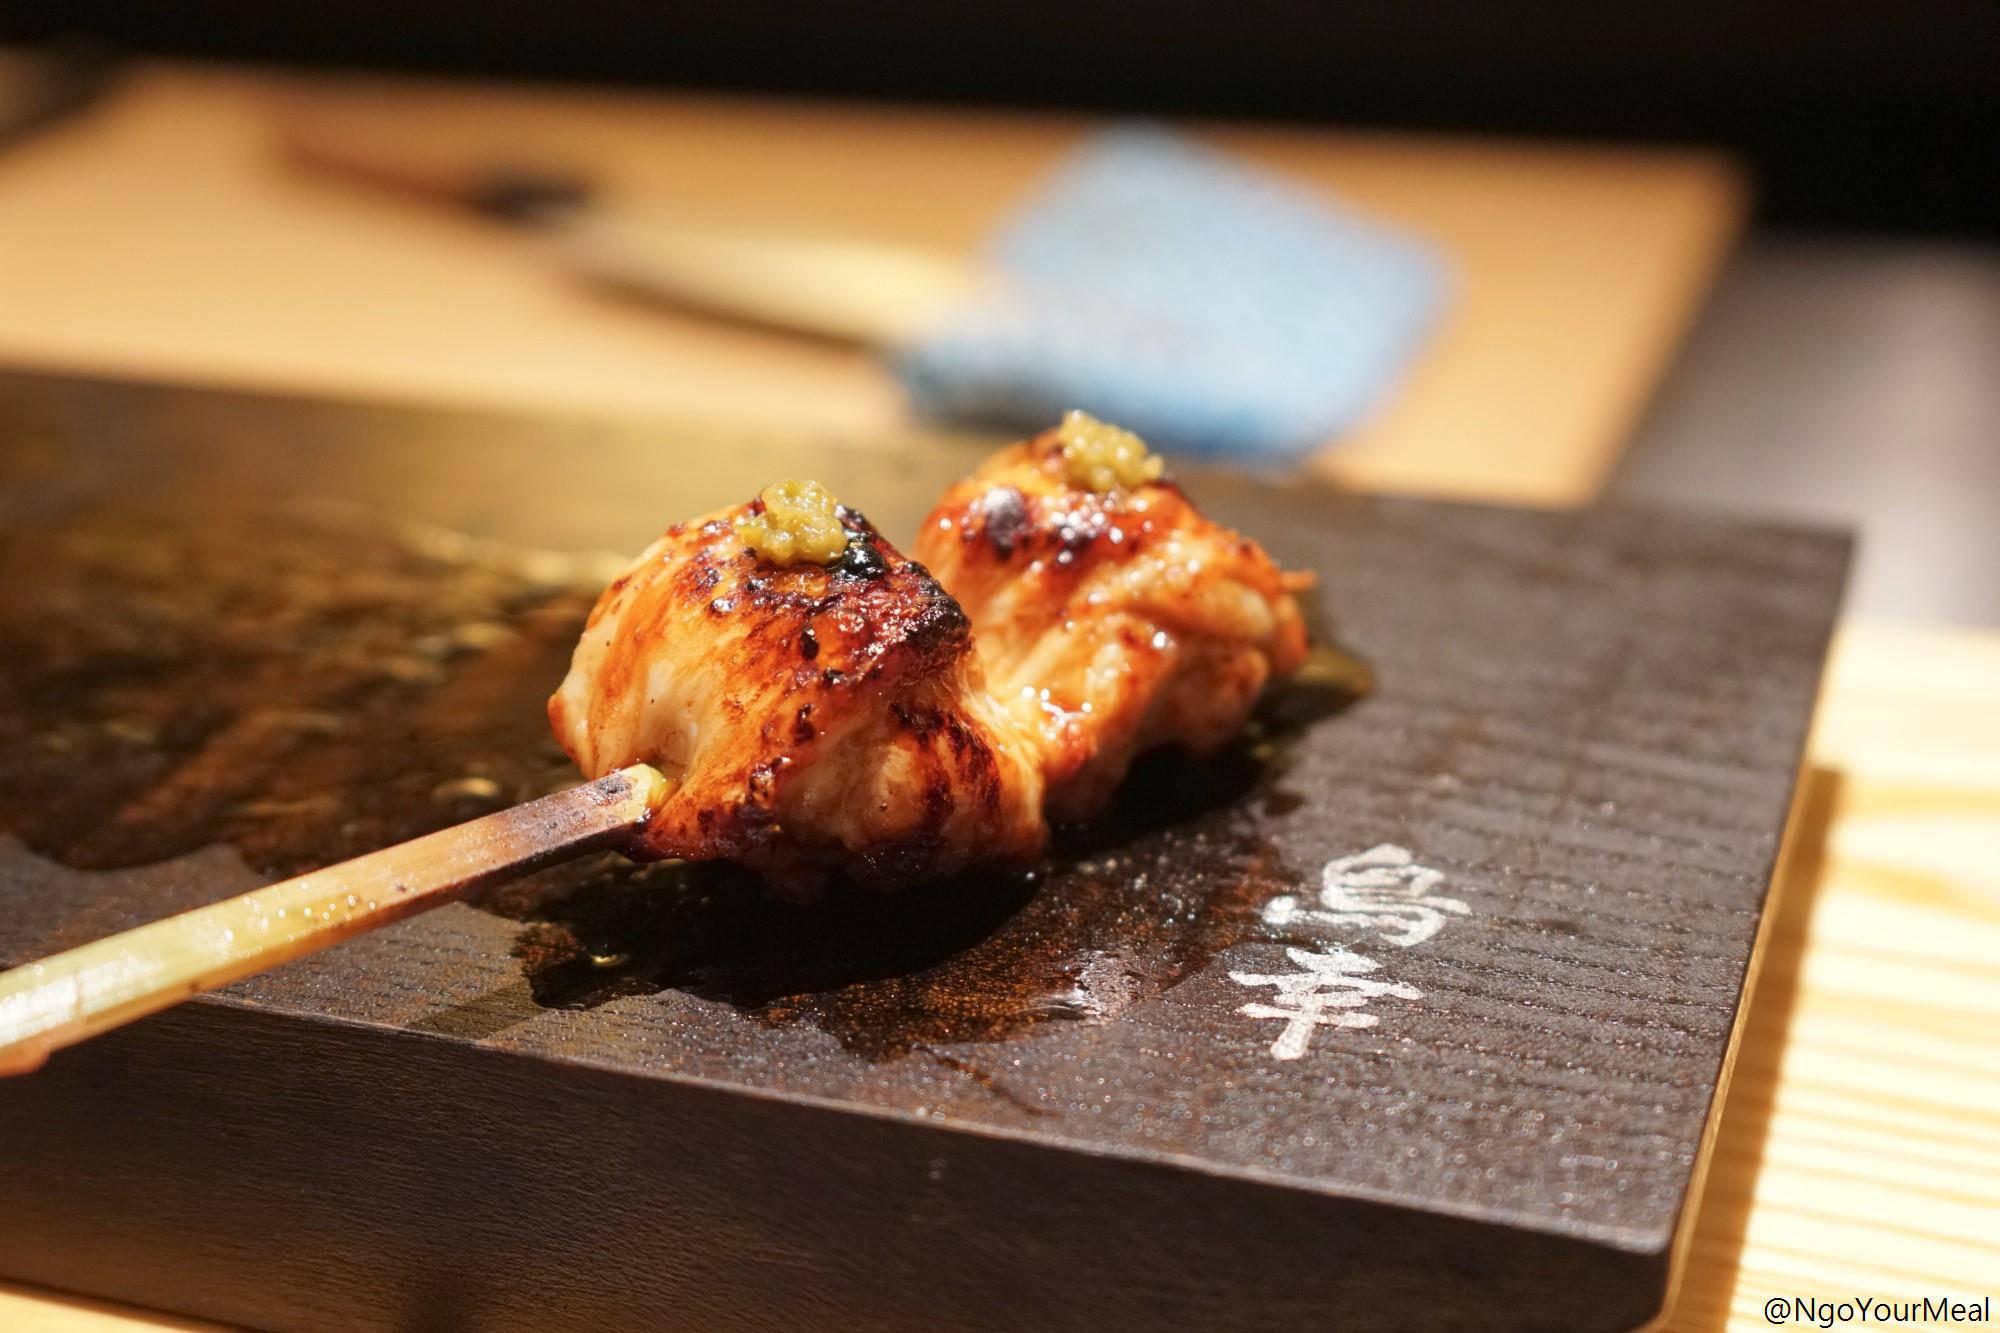 Chicken-Oyster-at-Toriko-in-New-York-City.jpg